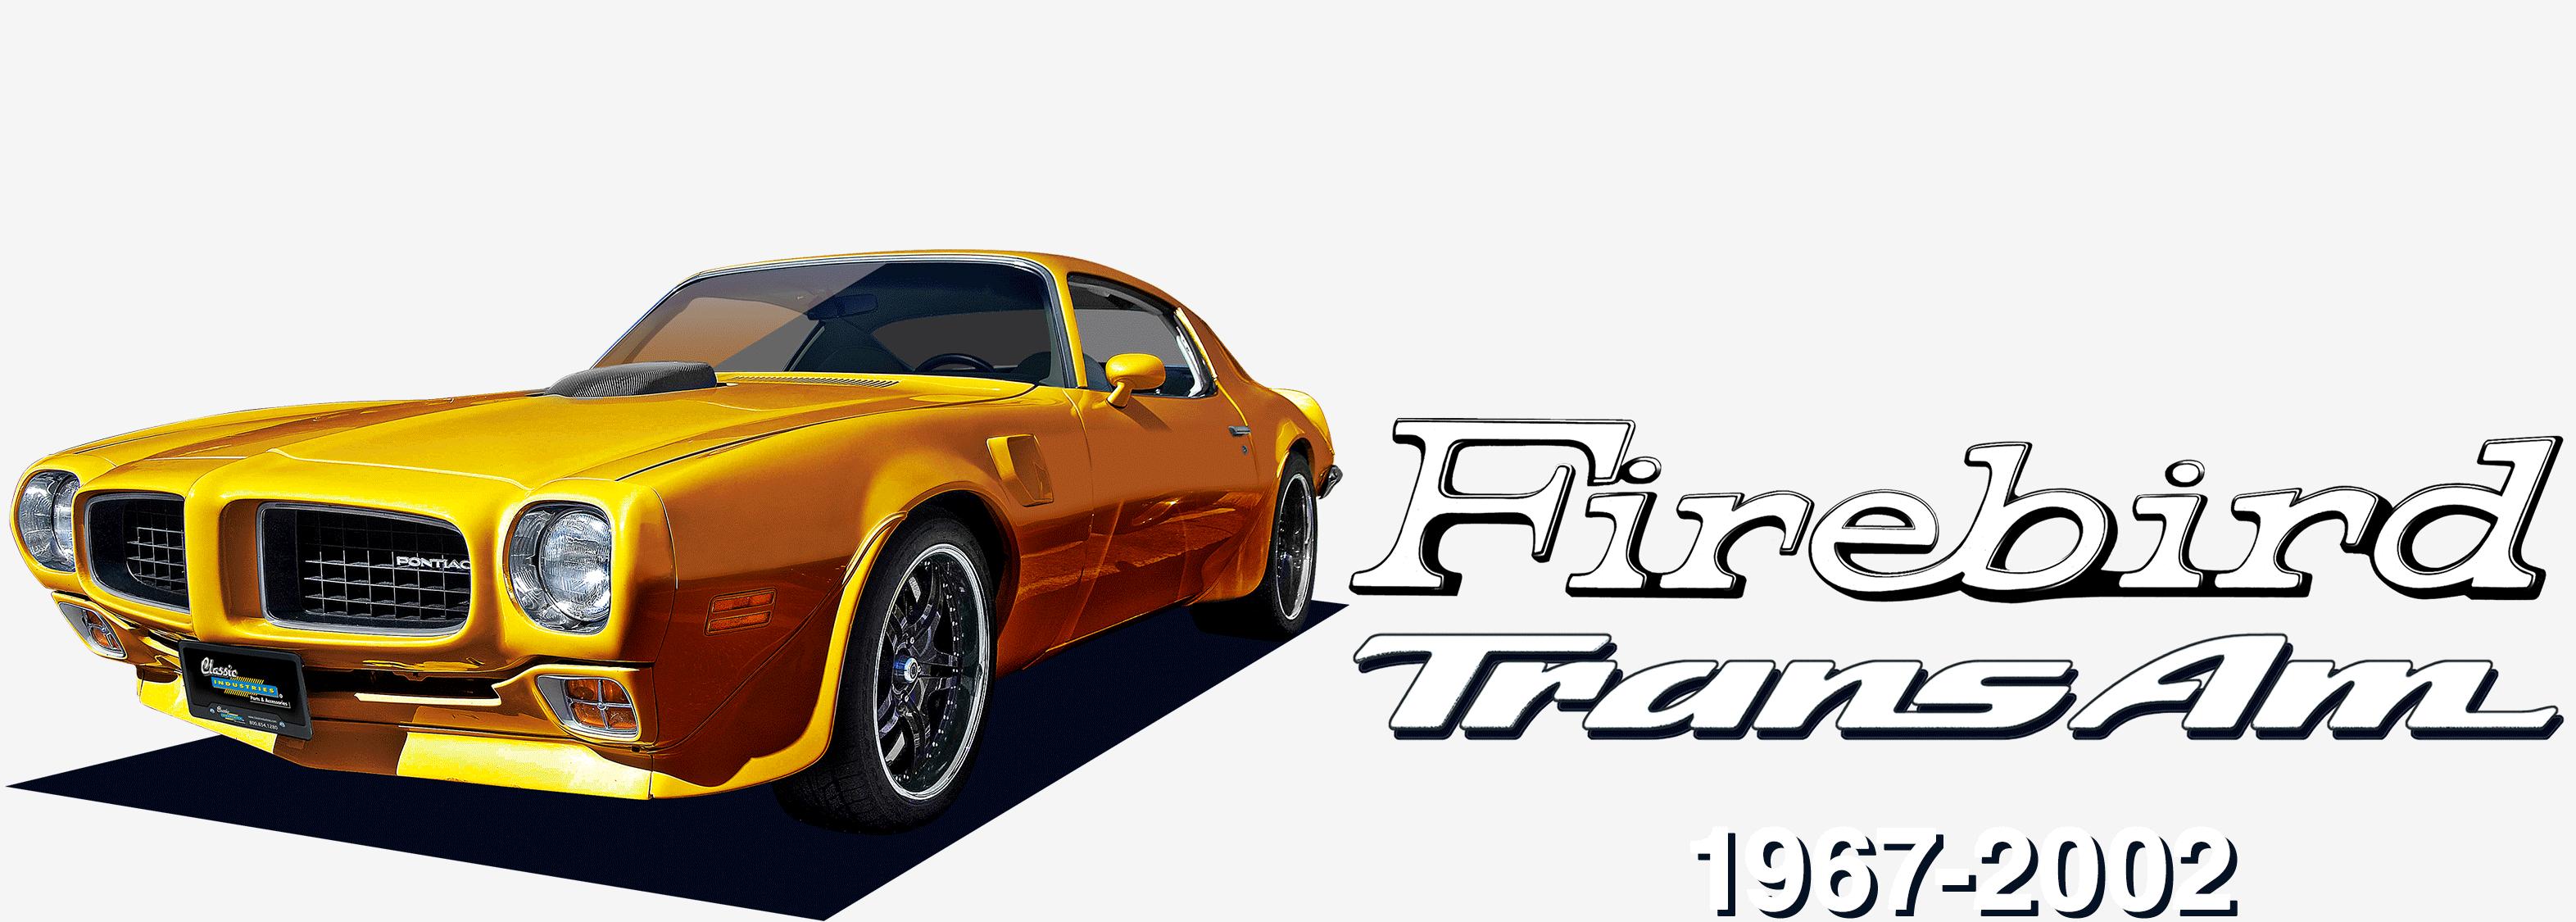 Sorry, pontiac firebird vintage parts that